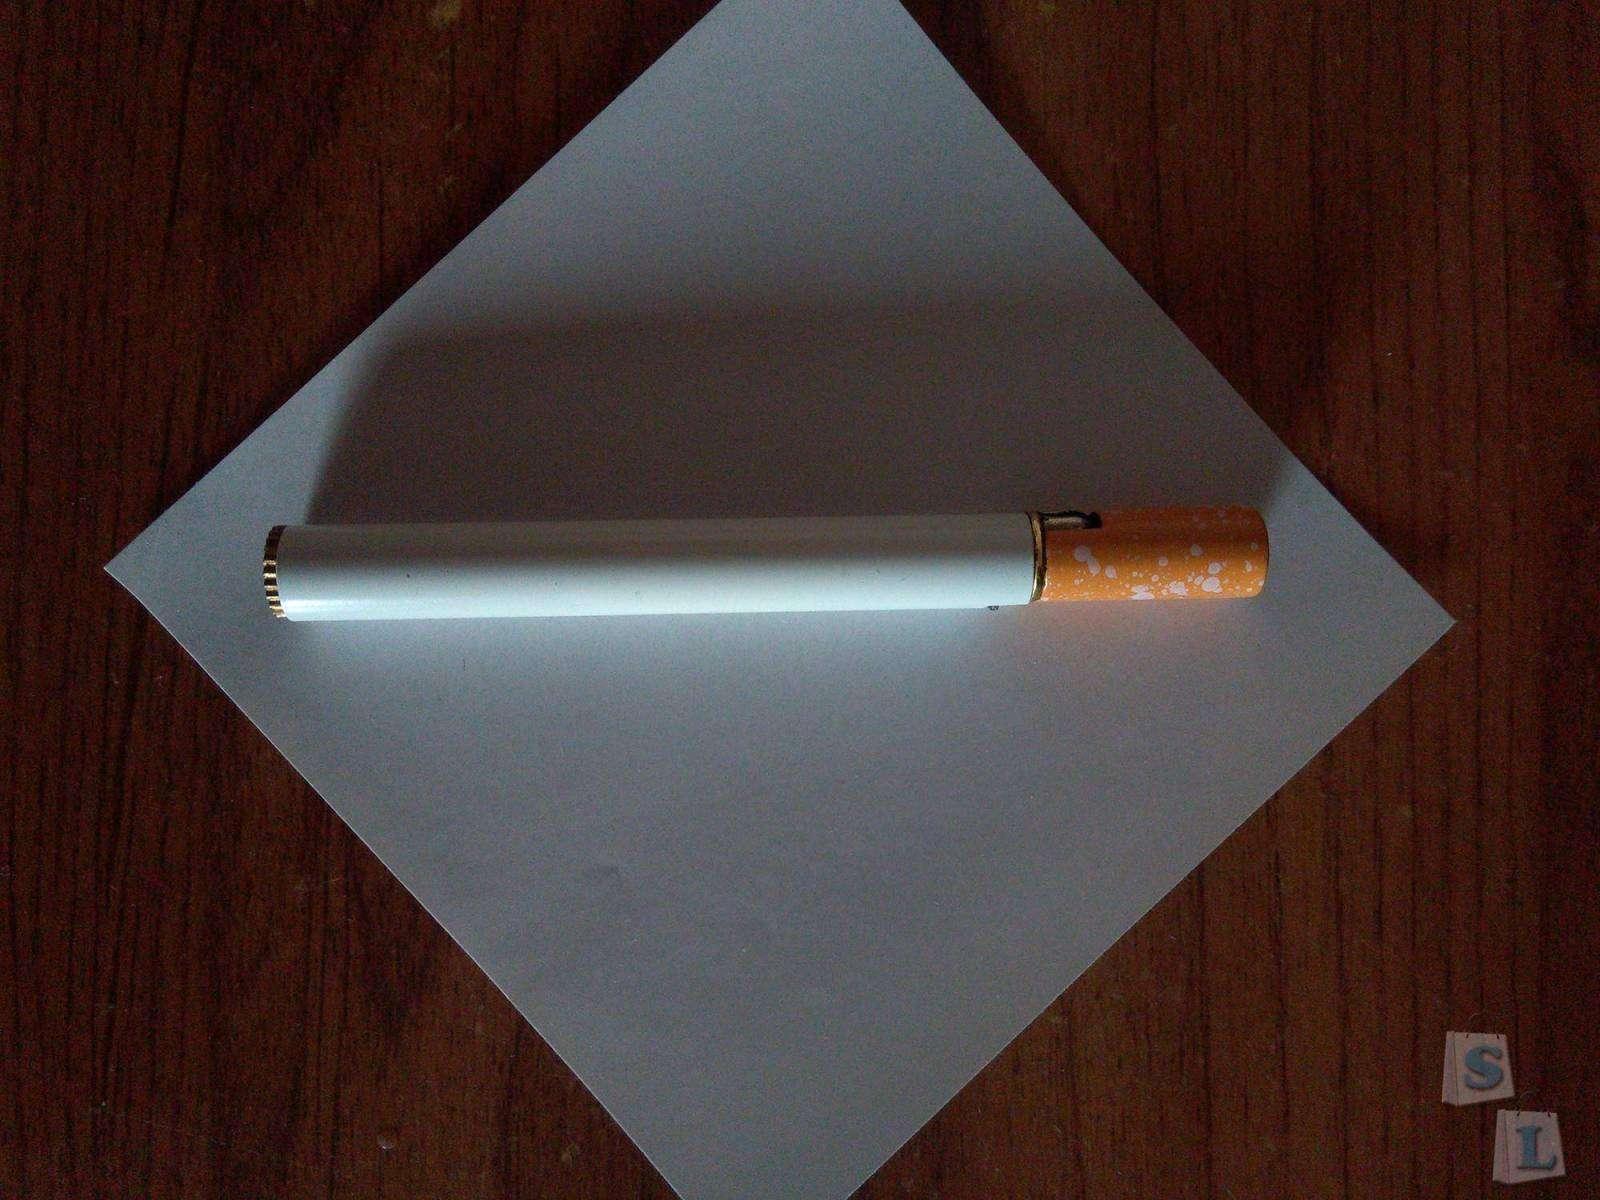 TinyDeal: Зажигалка сигарета или ностальгия по прошлому.